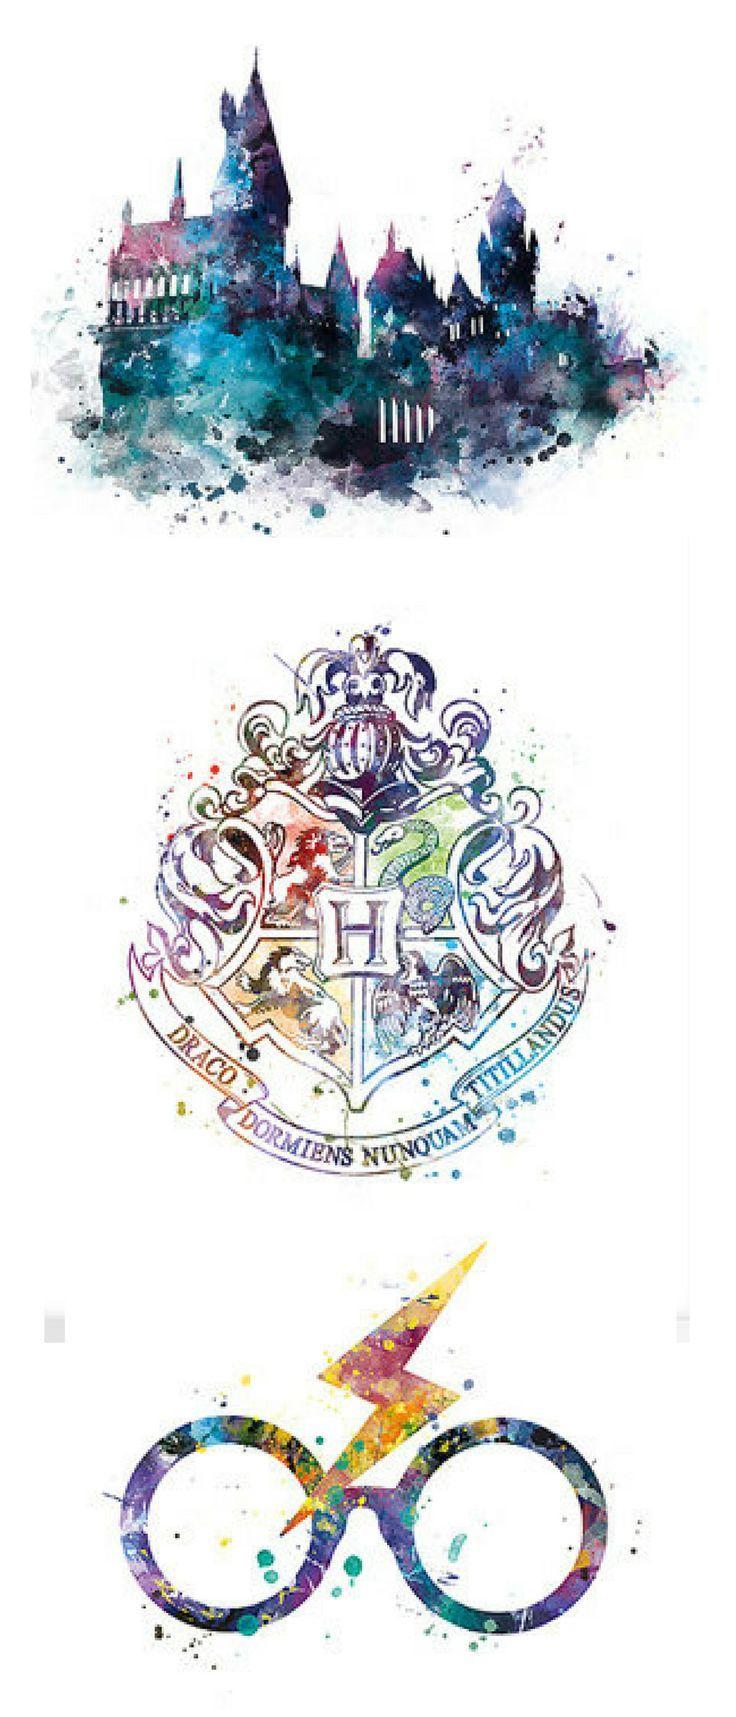 Harry Potter Printable Wall Art Hogwarts House Crests Glasses